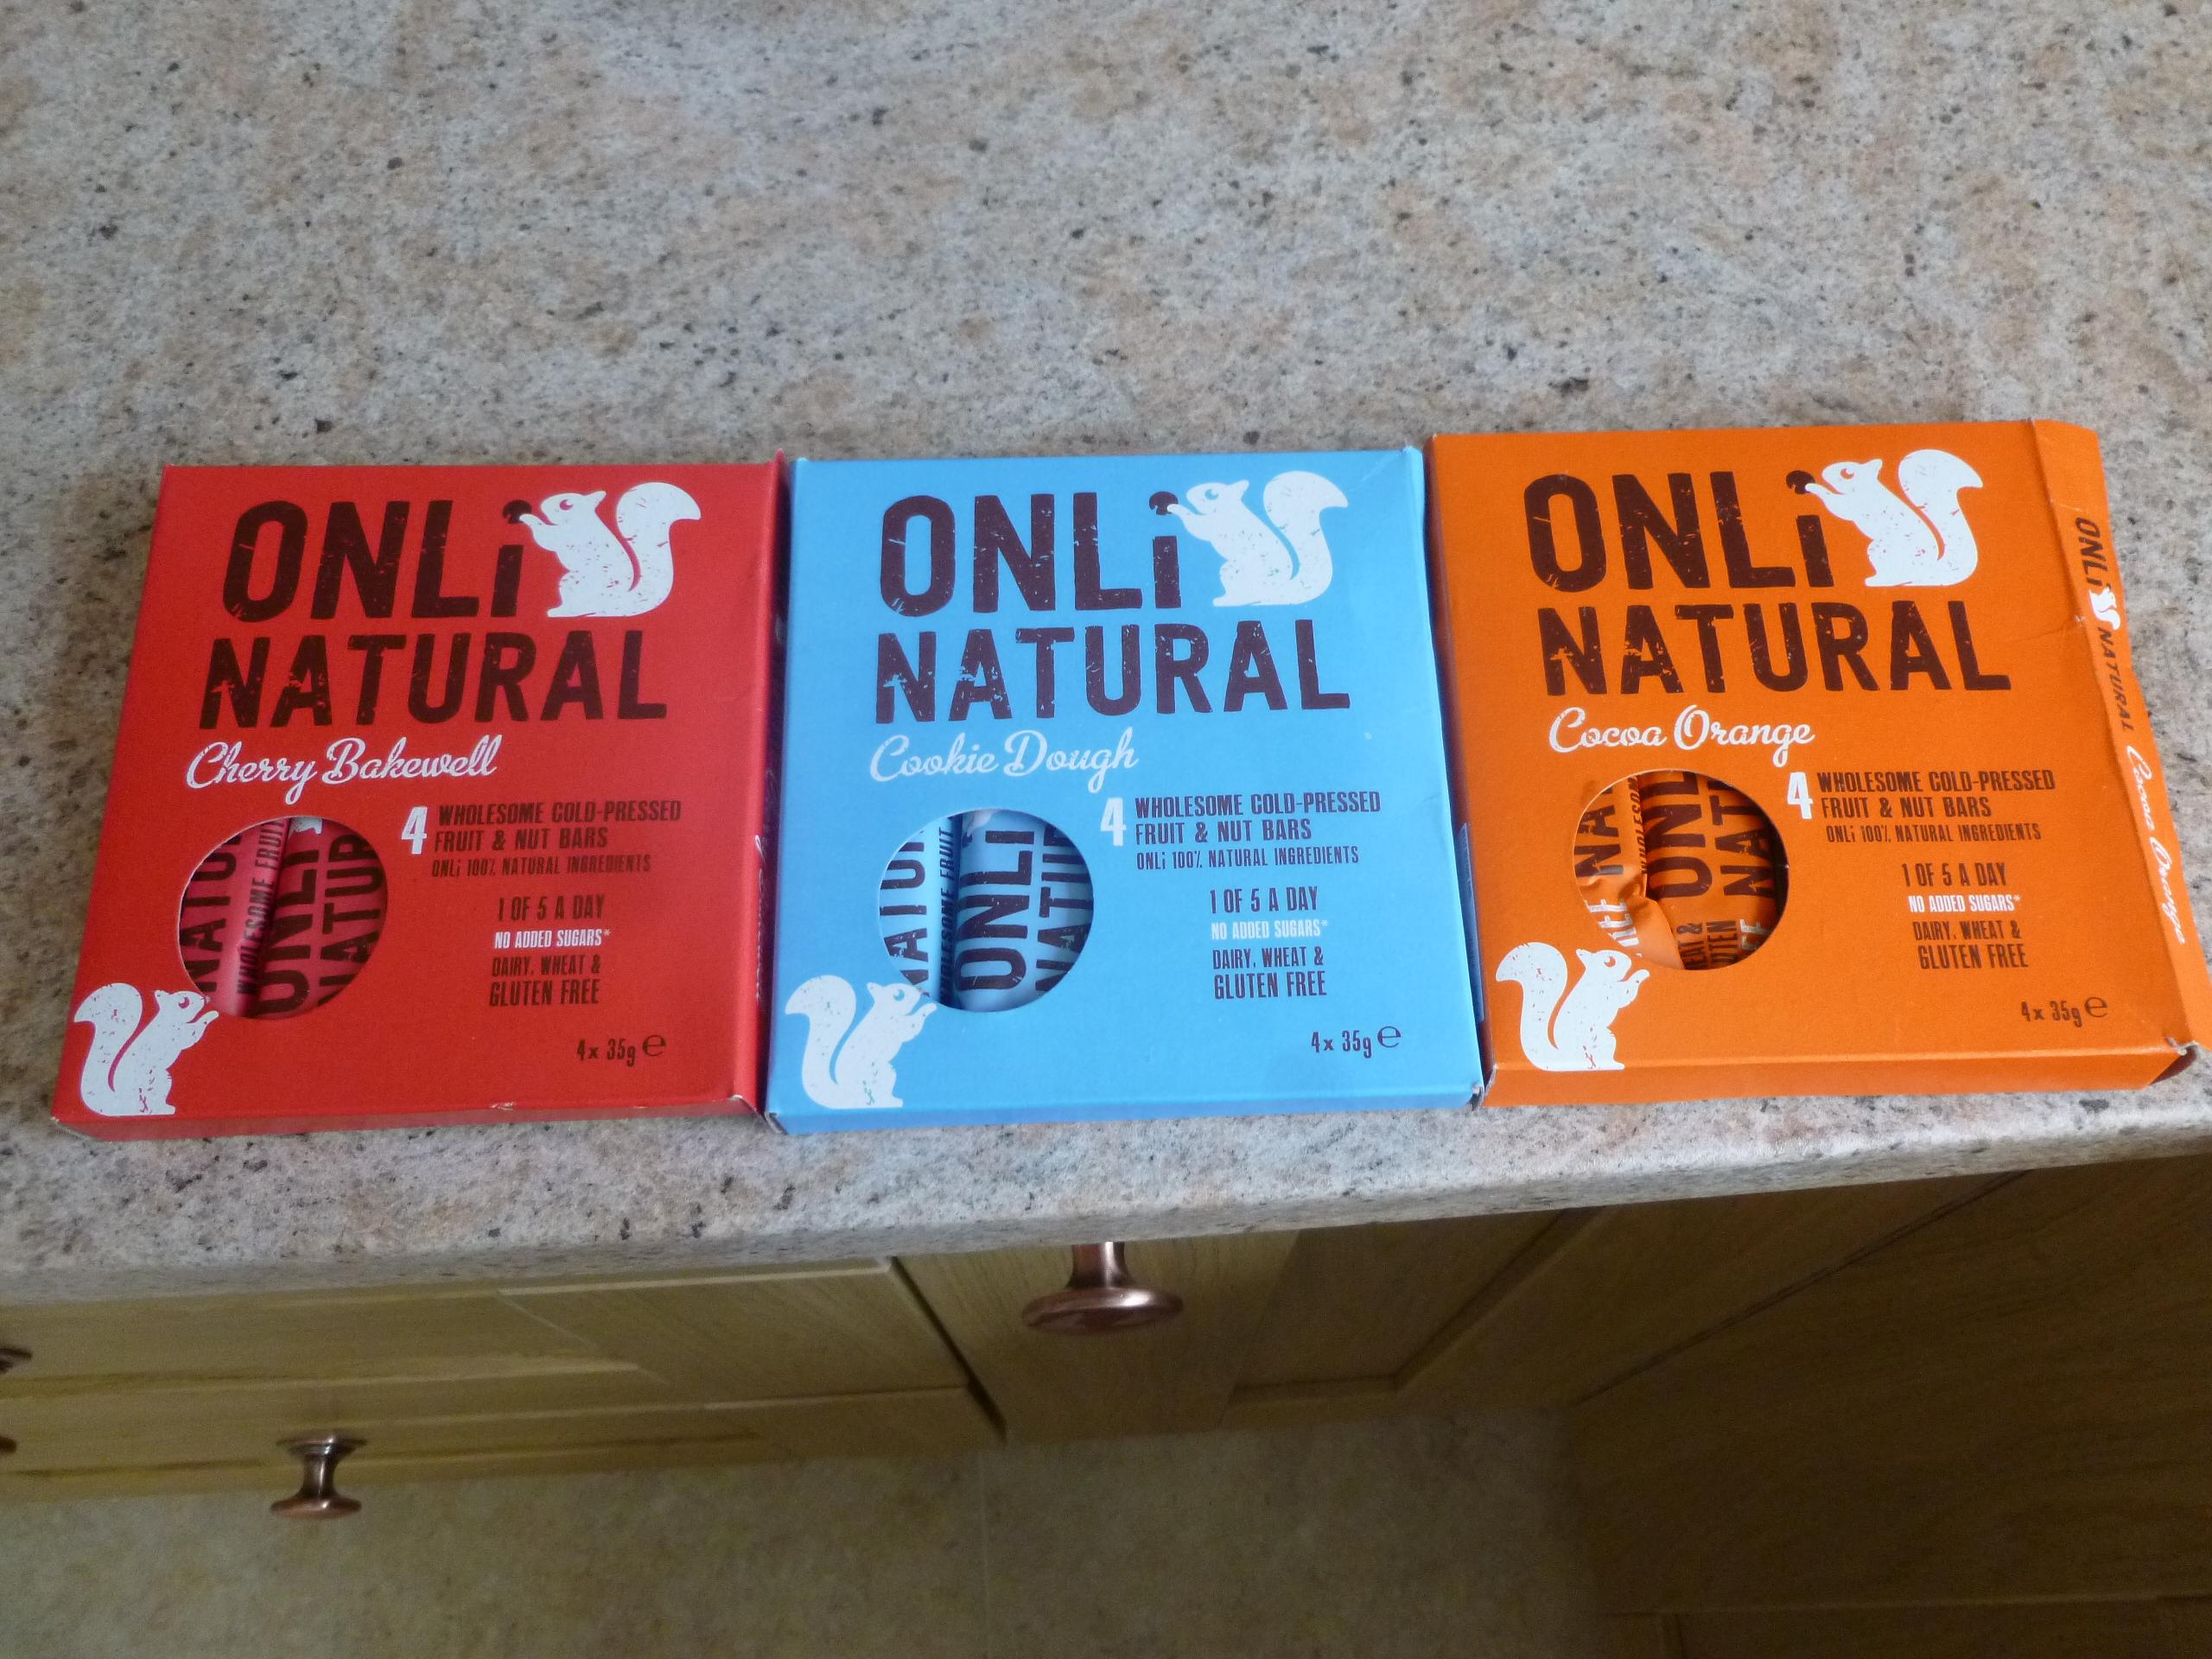 Onli Natural bars (like Nakd) - £1.49 (4 pack) at Home Bargains